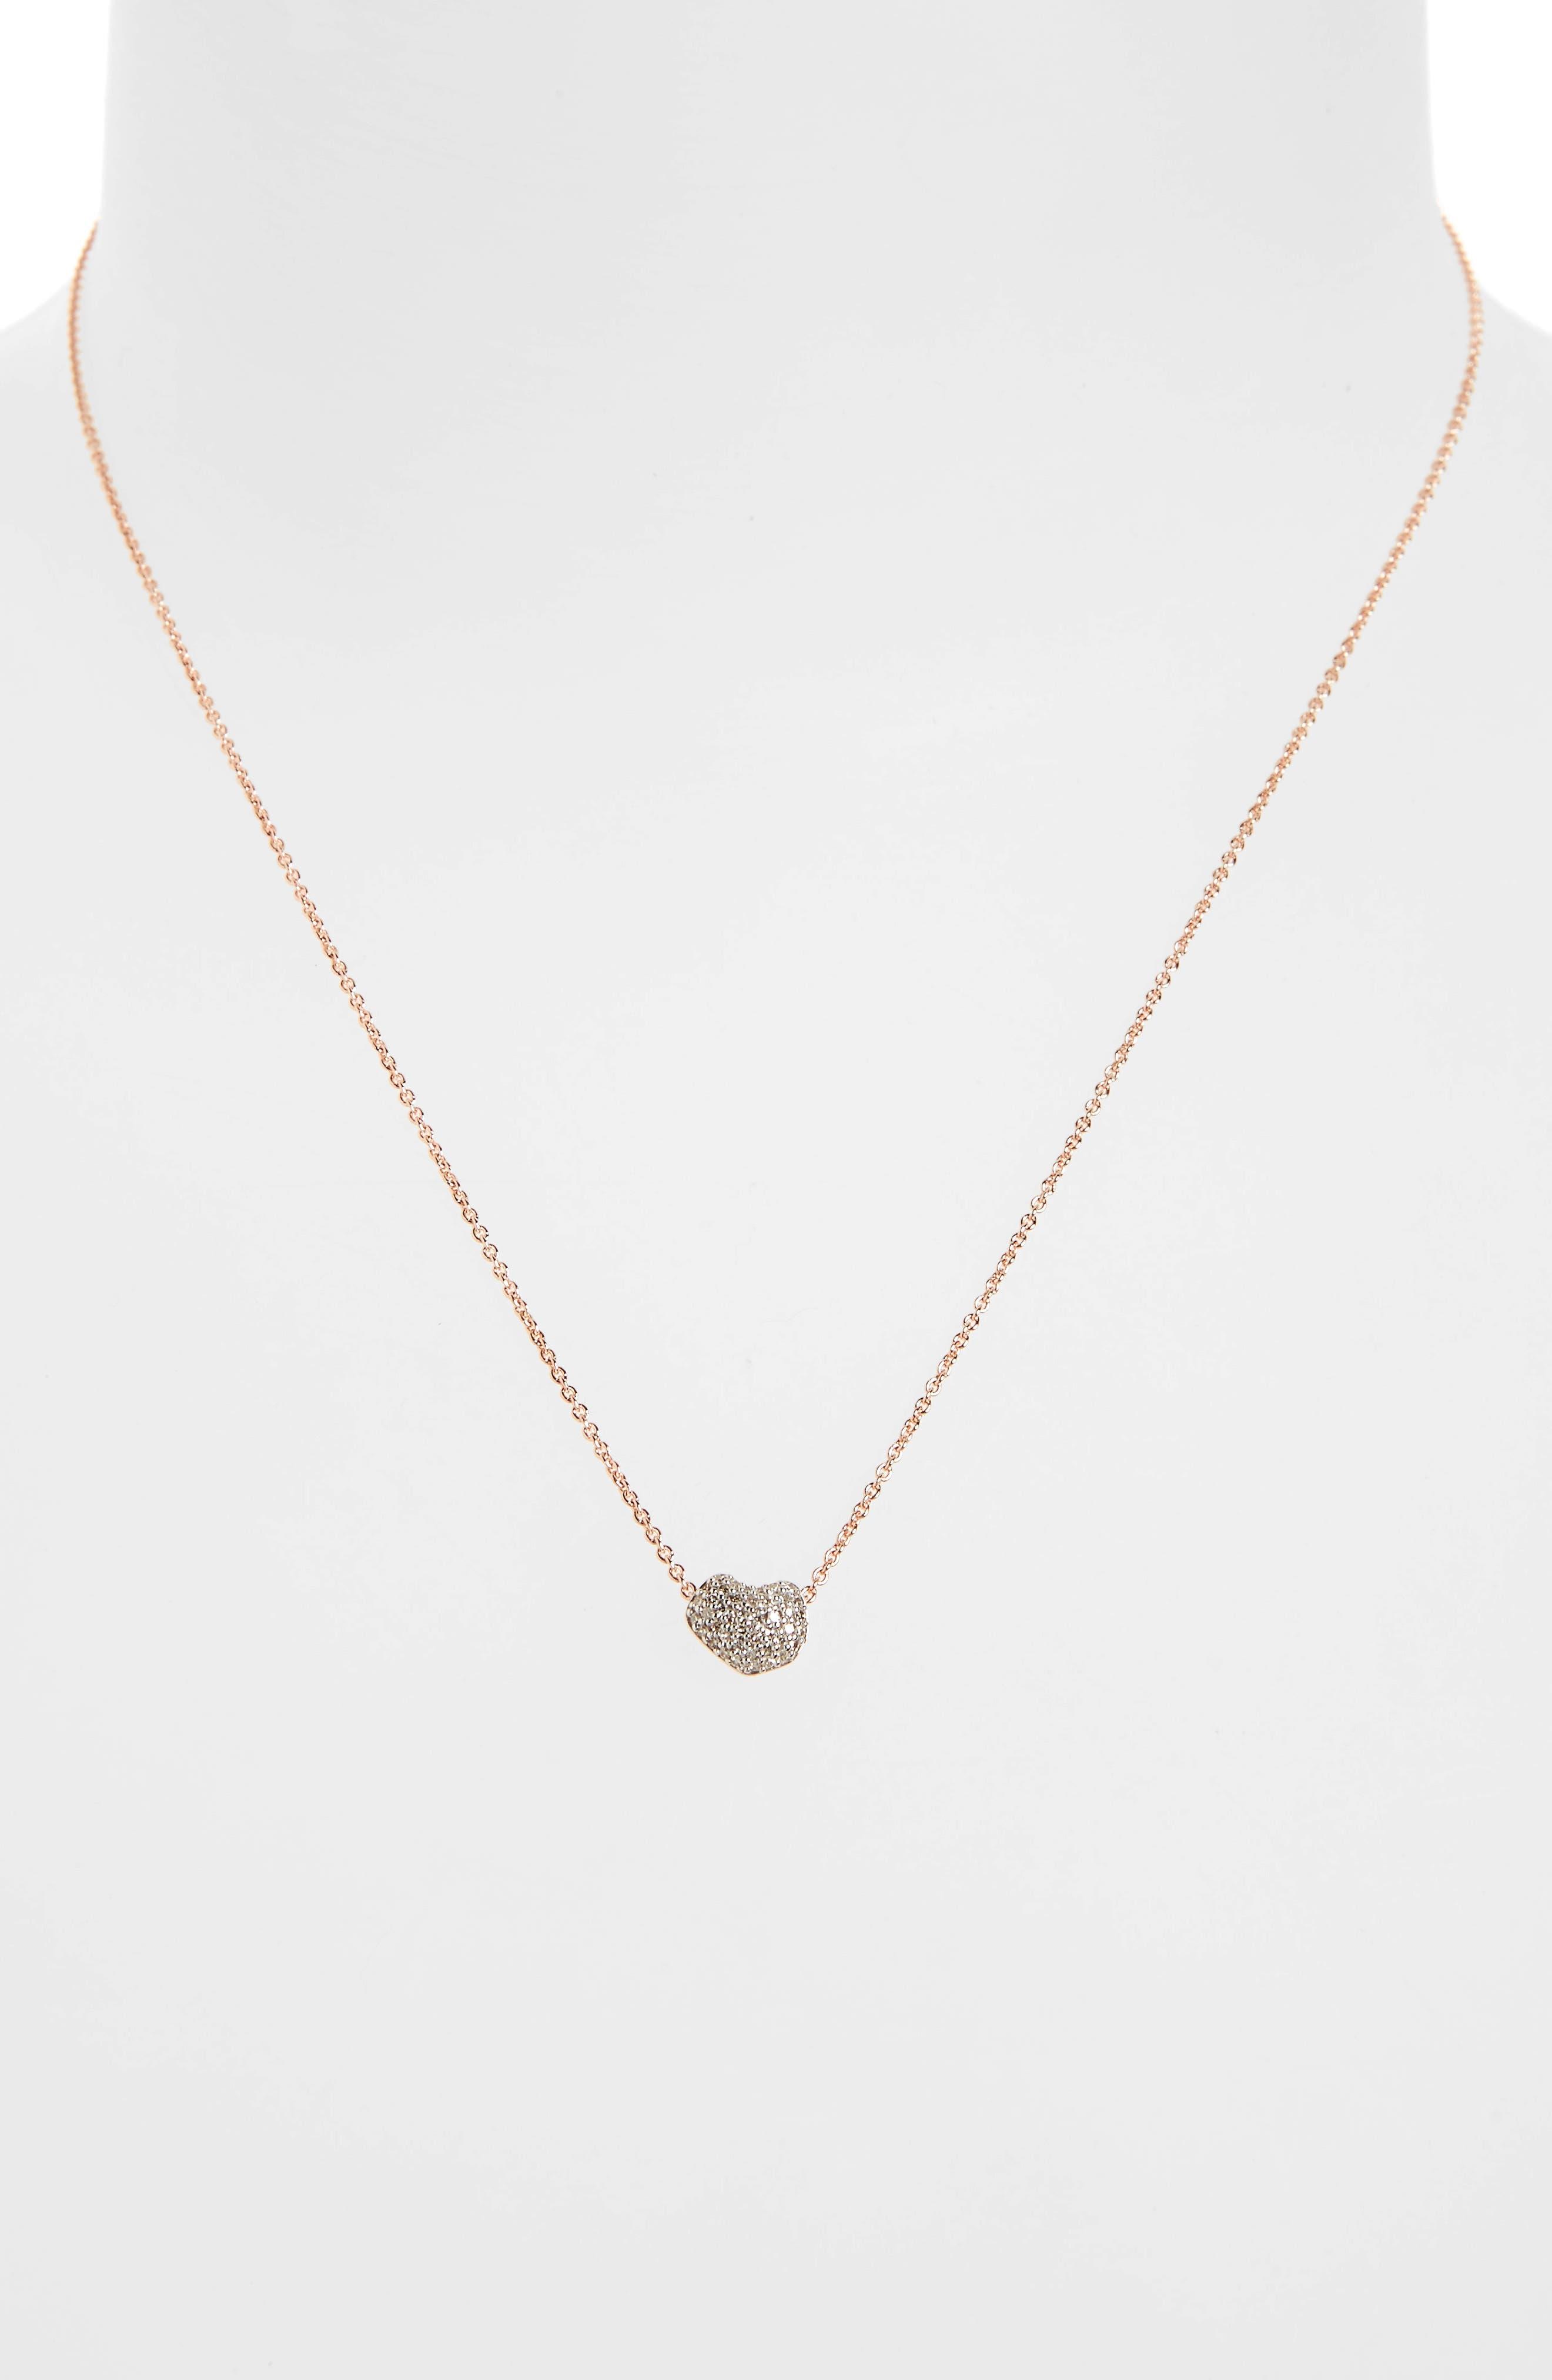 MONICA VINADER, Pavé Diamond Pendant Necklace, Alternate thumbnail 2, color, ROSE GOLD/ DIAMOND